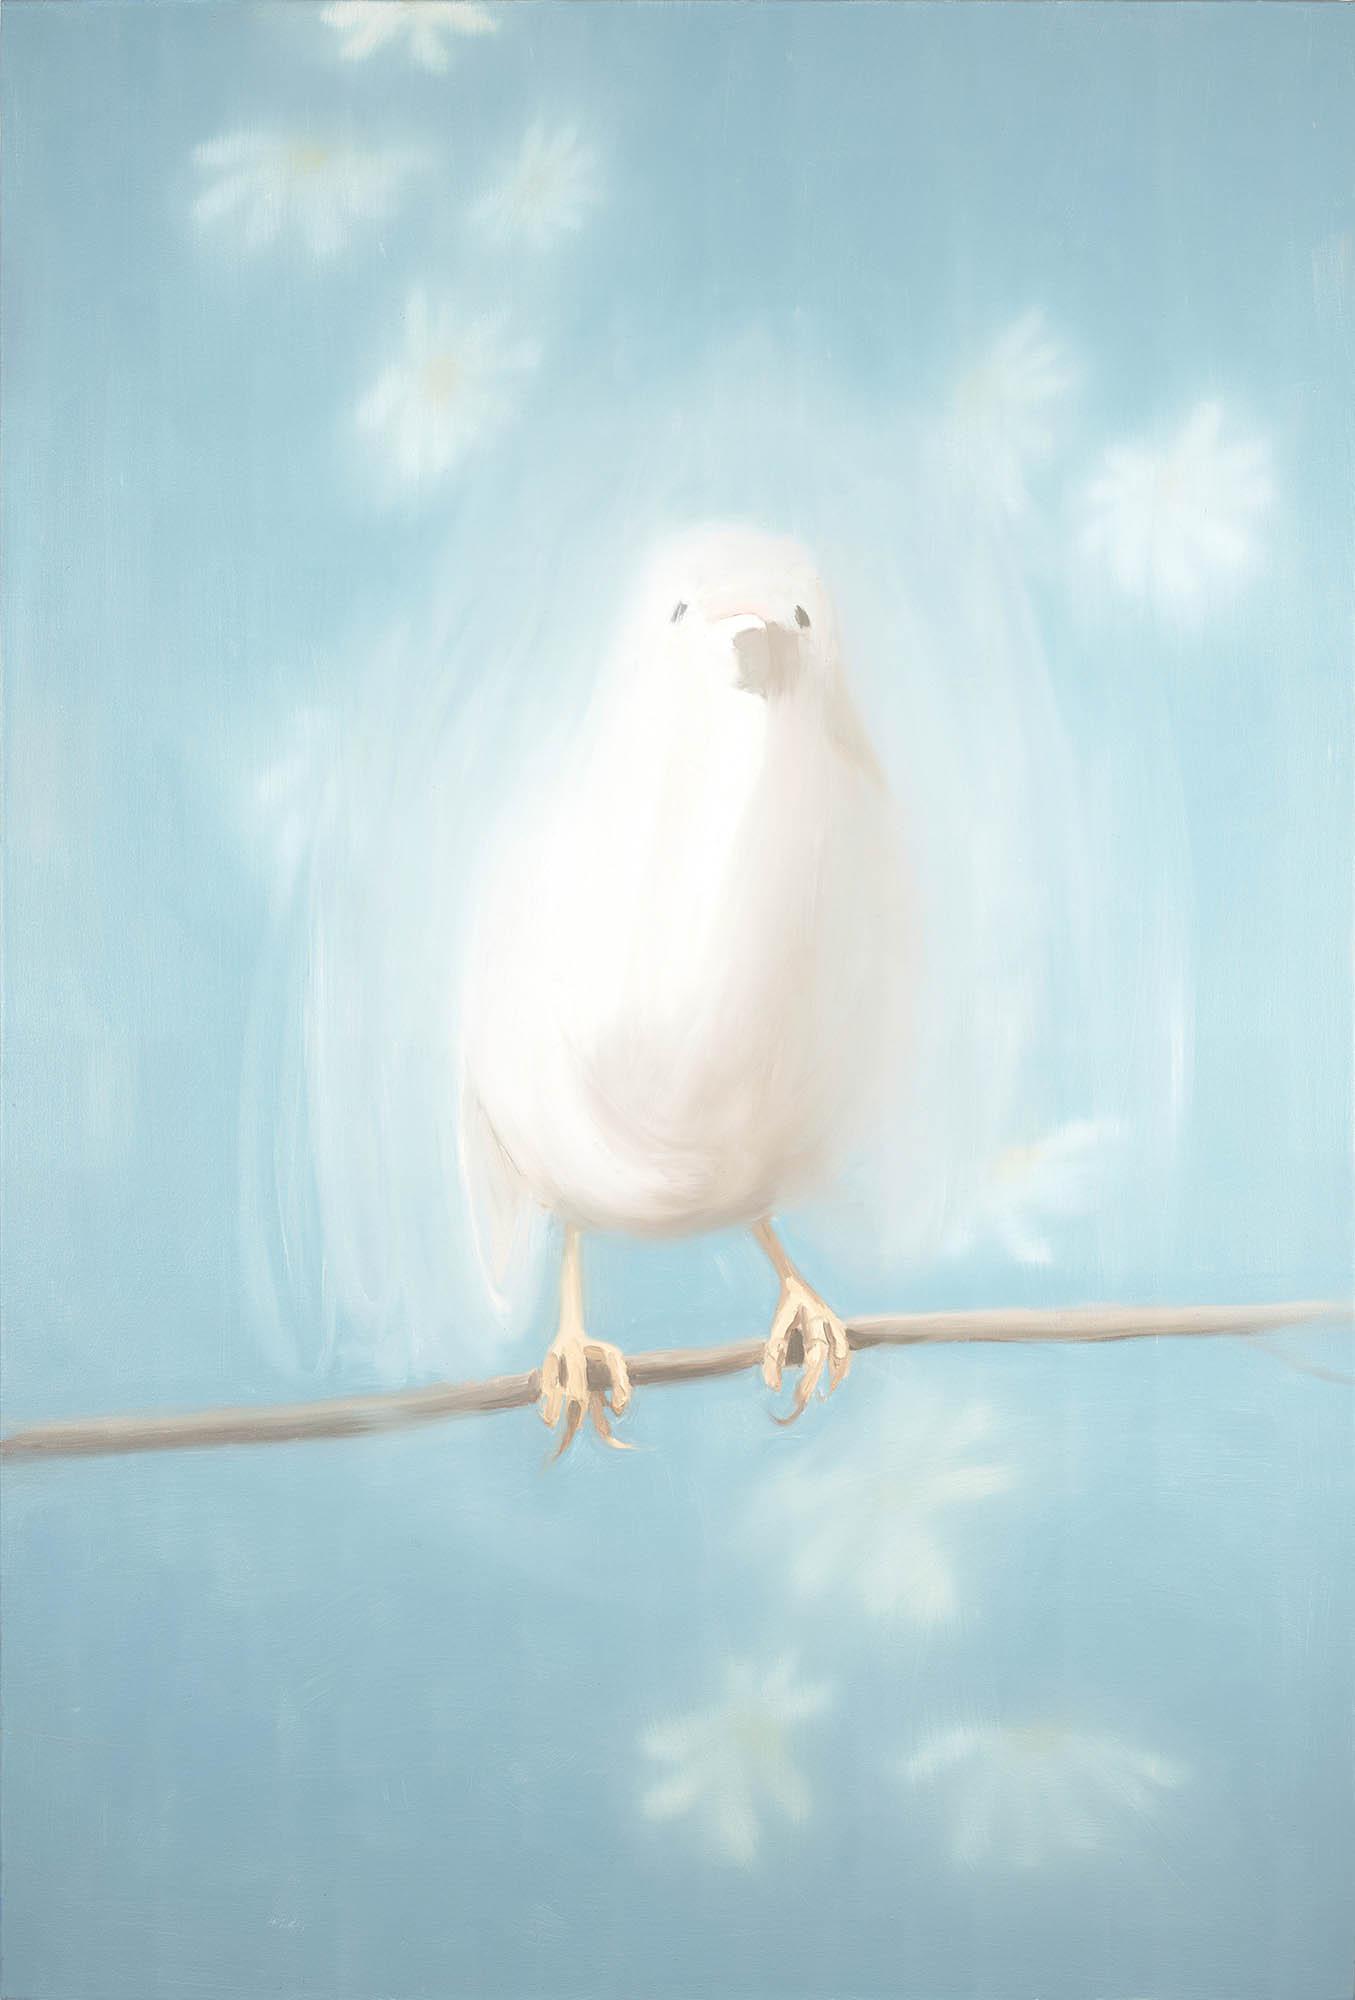 Image of Ann Craven, Bird in White (for Johnny Cash) (White Bird #1), 1998